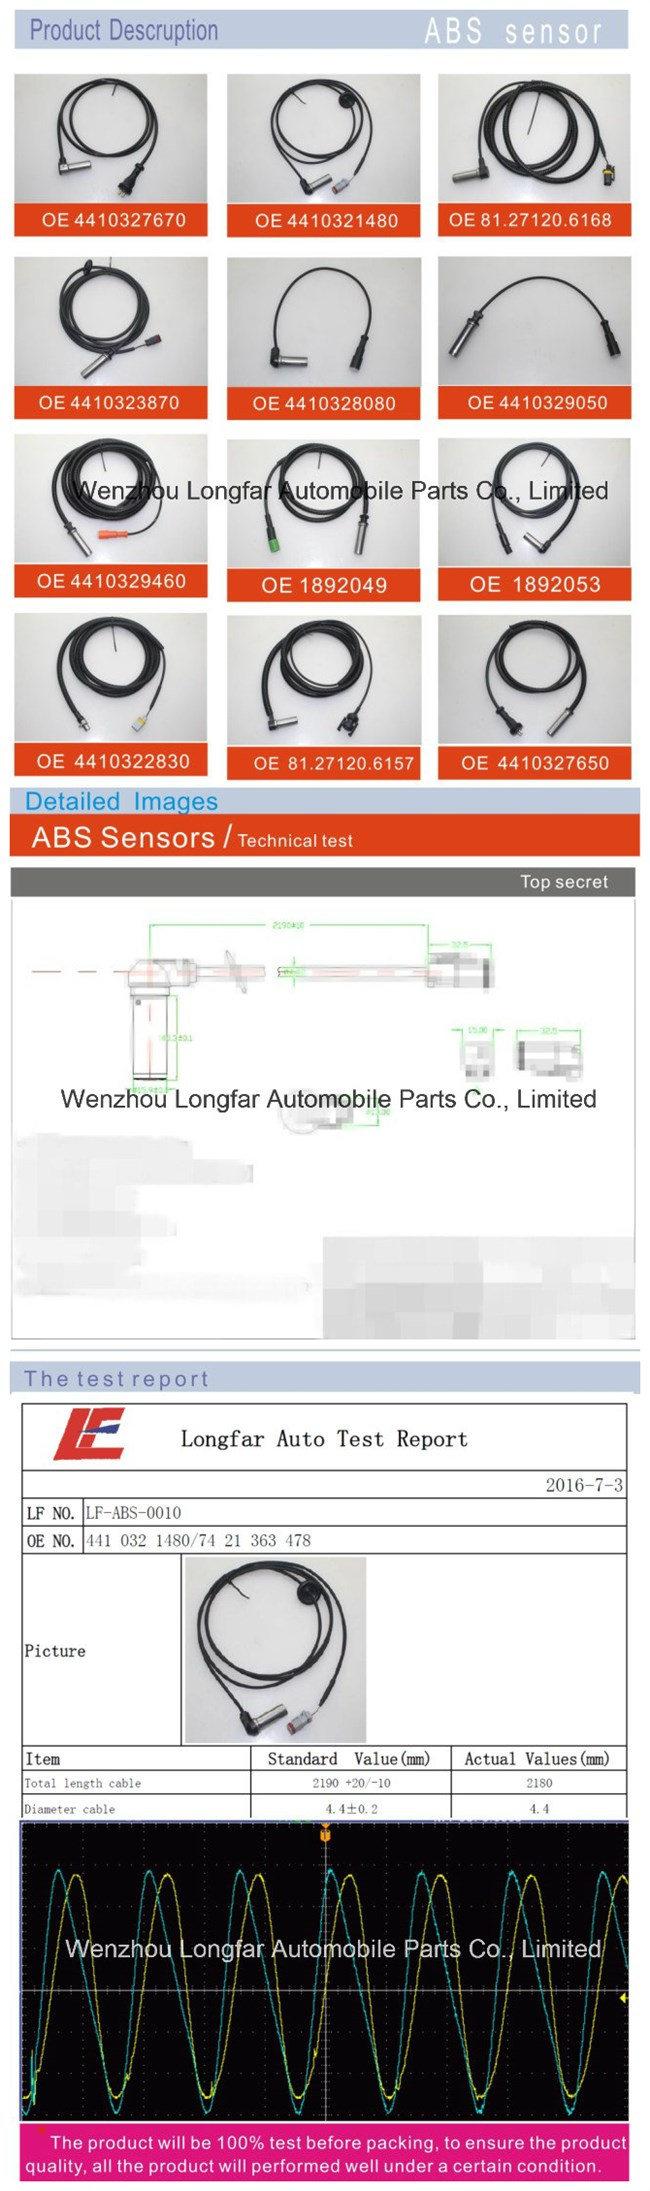 Auto Crankshaft Position Sensor Engine Speed Transducer Indicator Sensor PC421,5s1269,Su1380,386100,Su4235,Css1613 for GM,Buick,Daewoo,Isuzu,Wells,Carquest